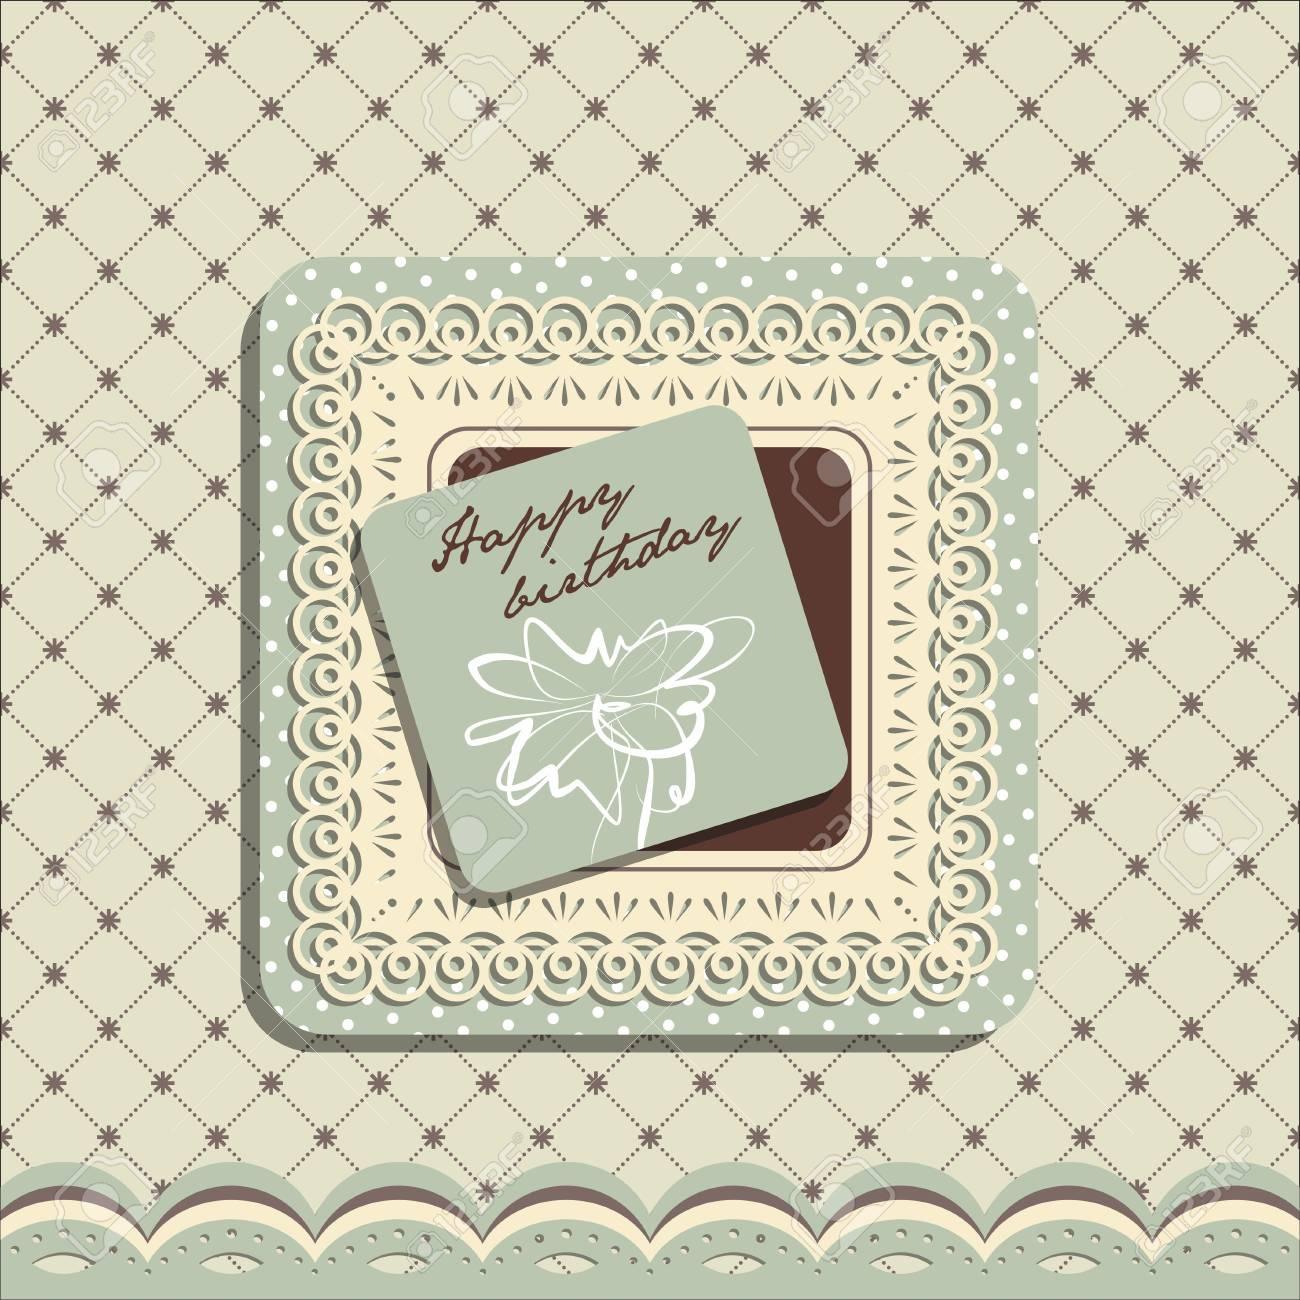 Happy Birthday greeting card Stock Vector - 17728519